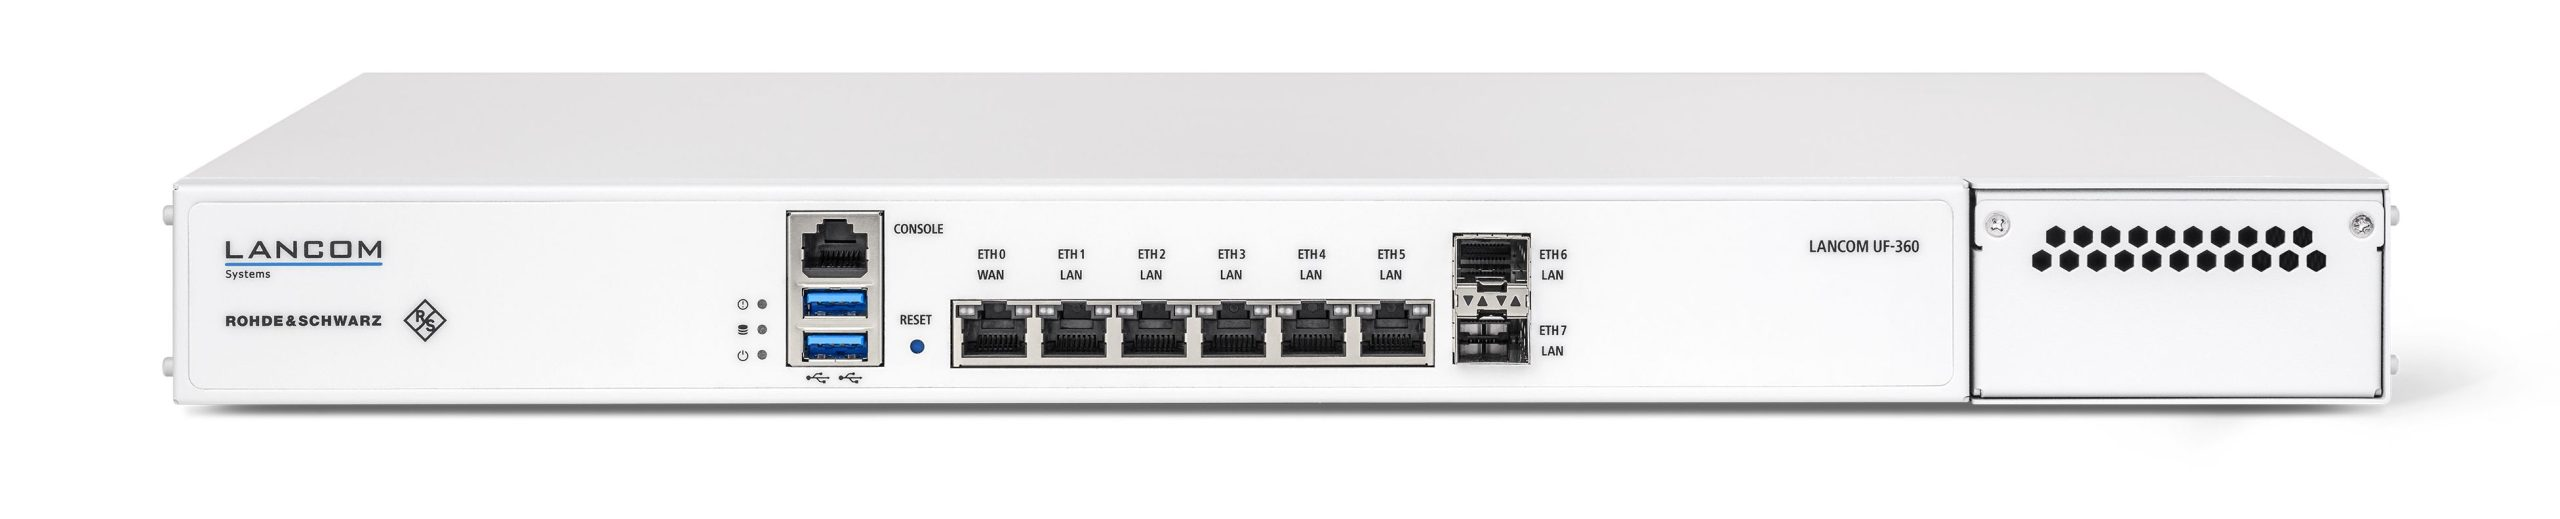 Firewall mit SSL Inspection